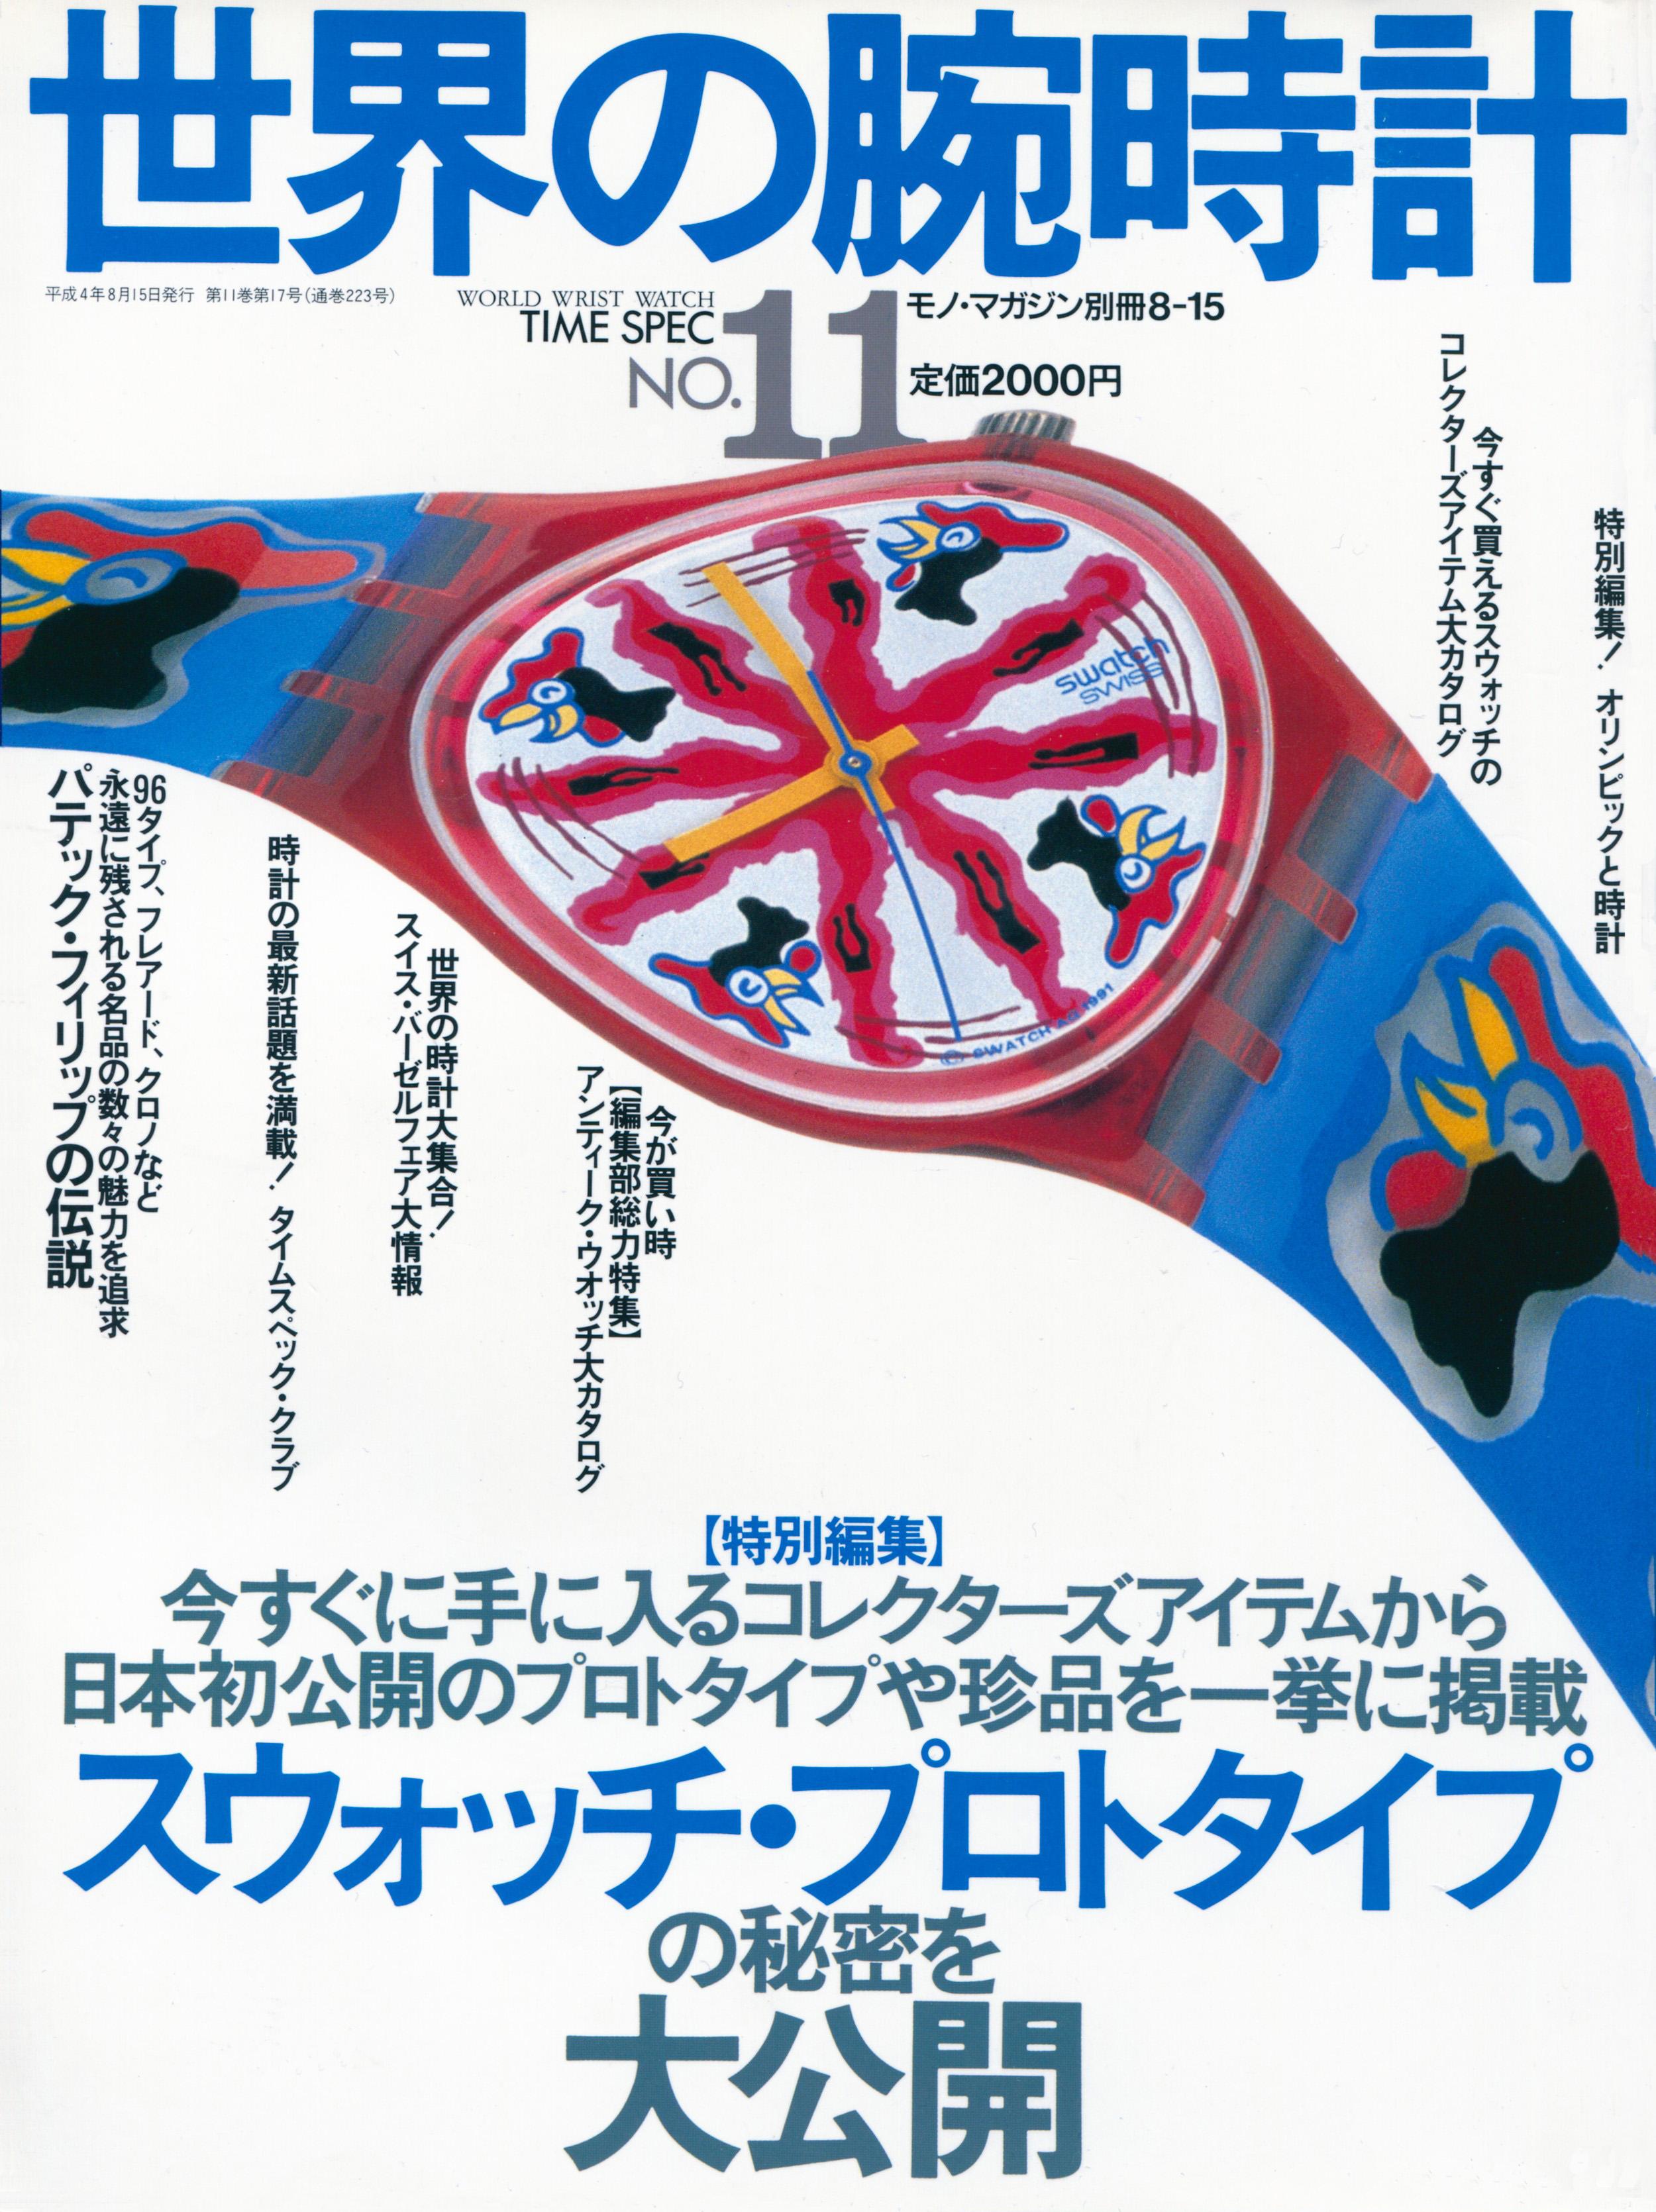 TimeSpec No. 11